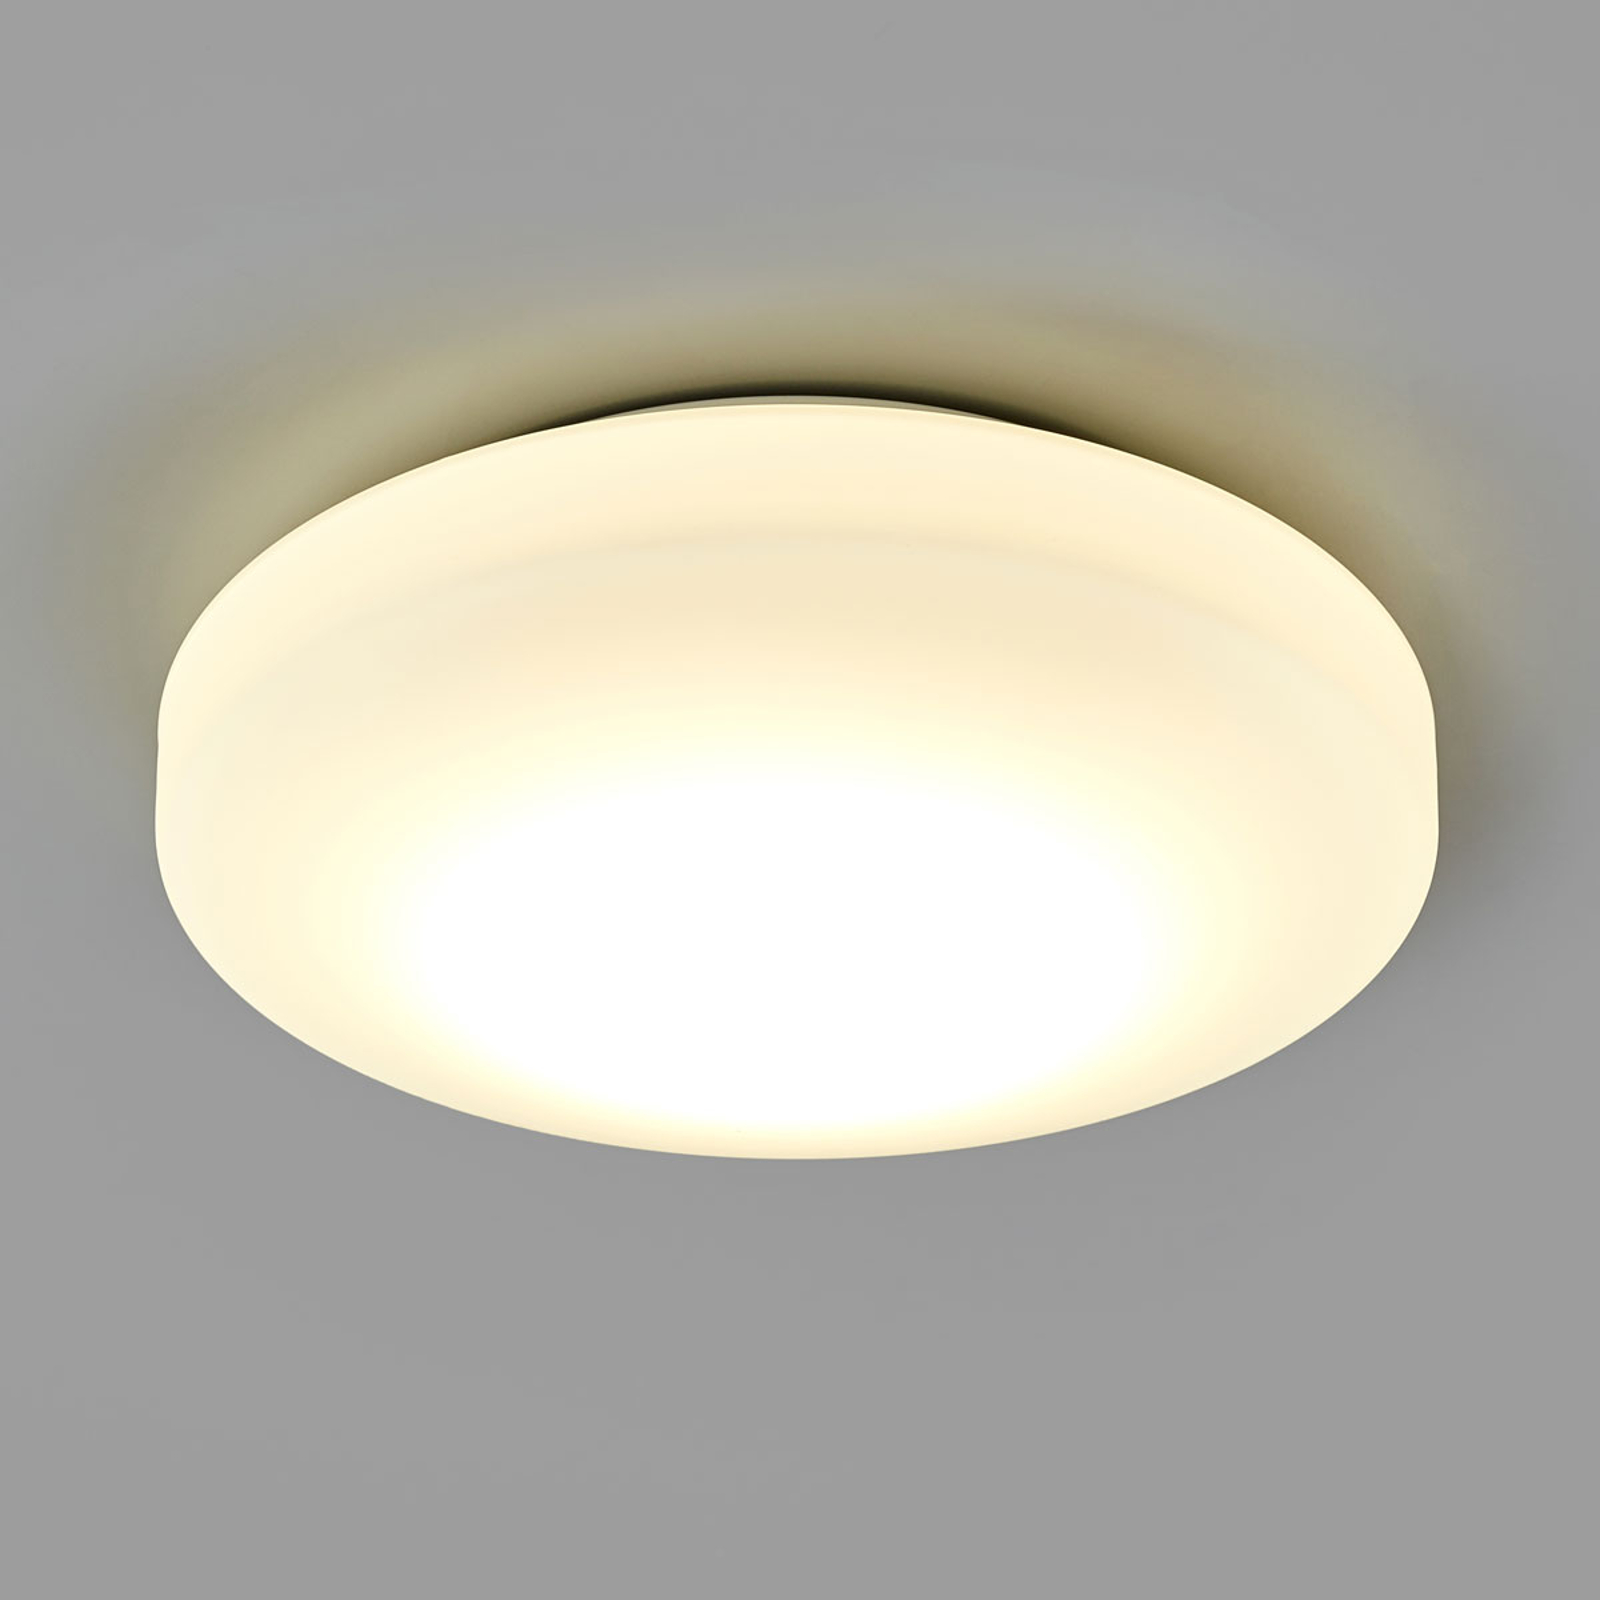 LED-Bad-taklampe Malte  i Opalglass